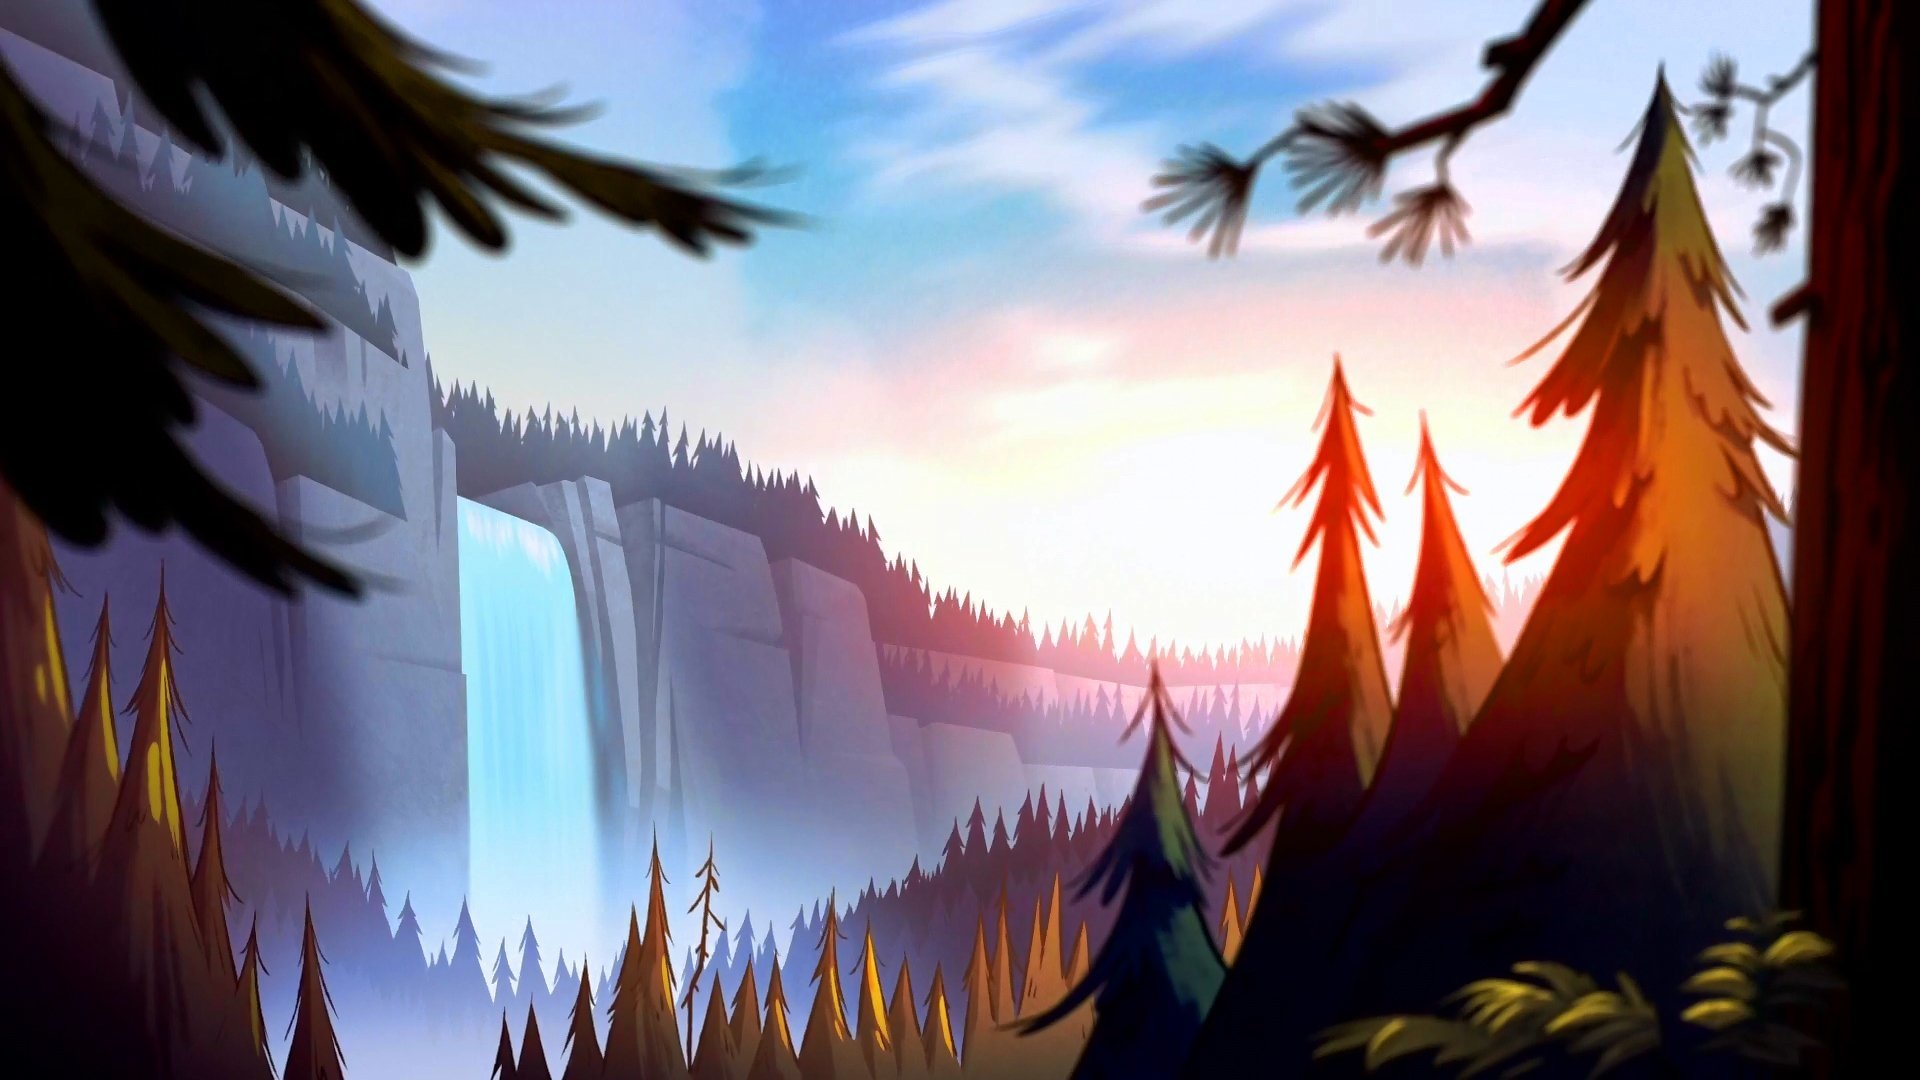 Gravity Falls Wallpaper Hd , HD Wallpaper & Backgrounds